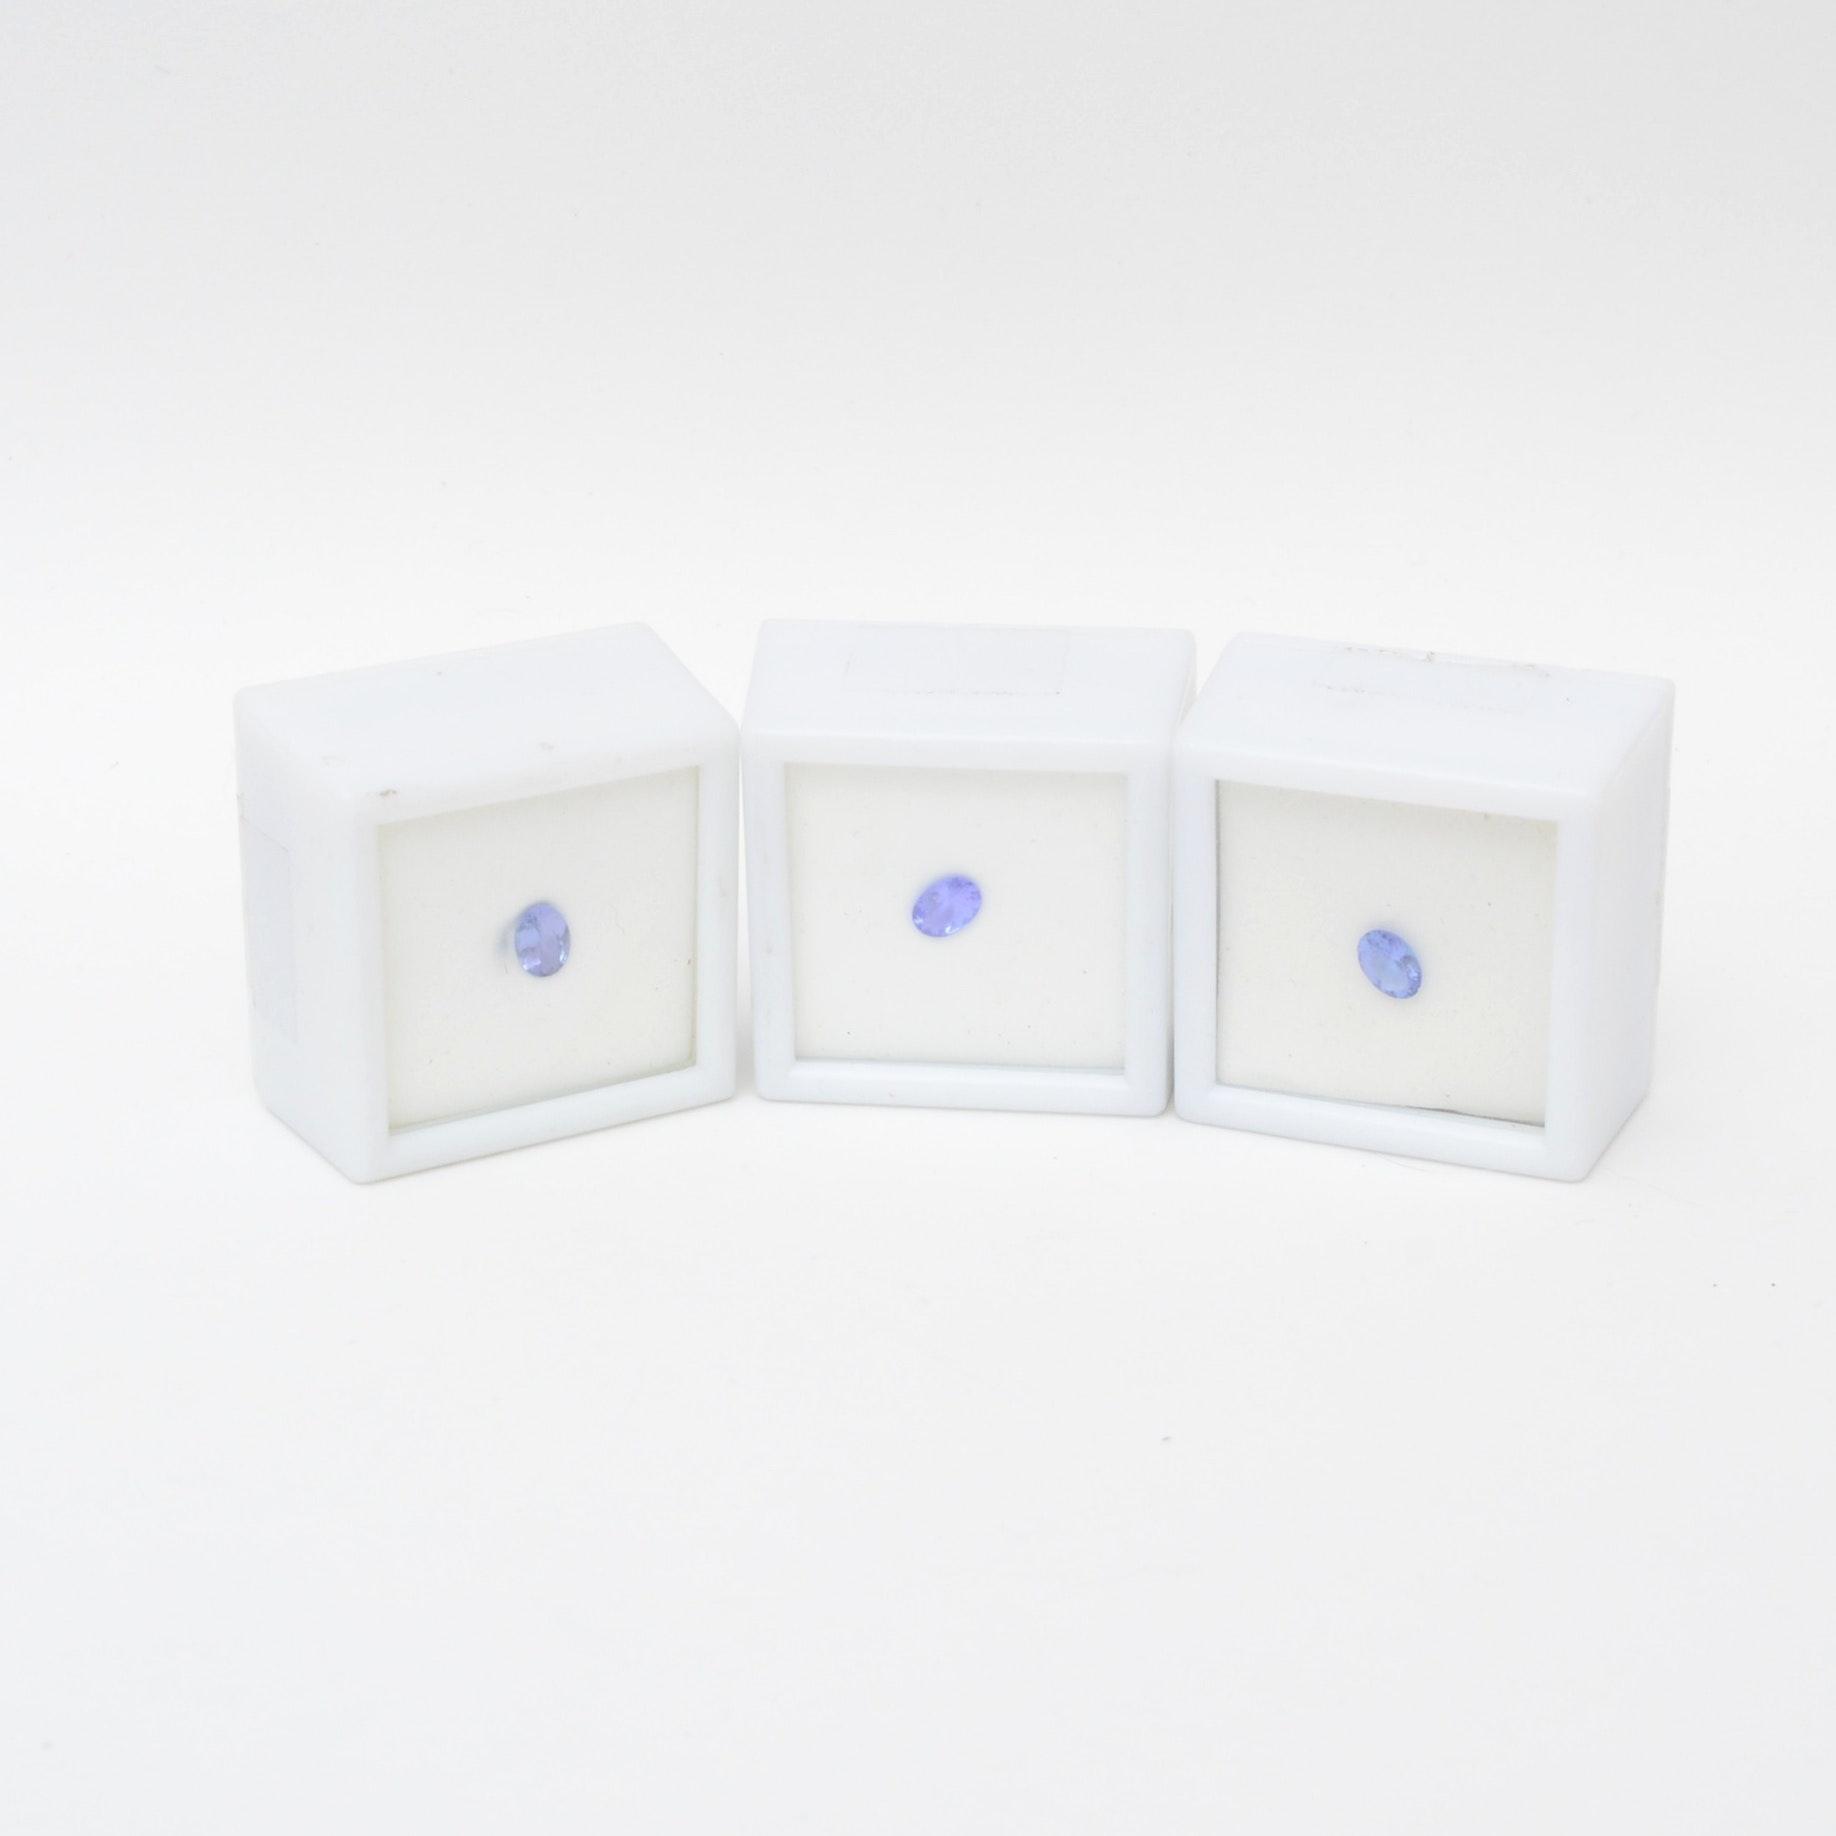 Grouping of Three Tanzanite Loose Gemstones